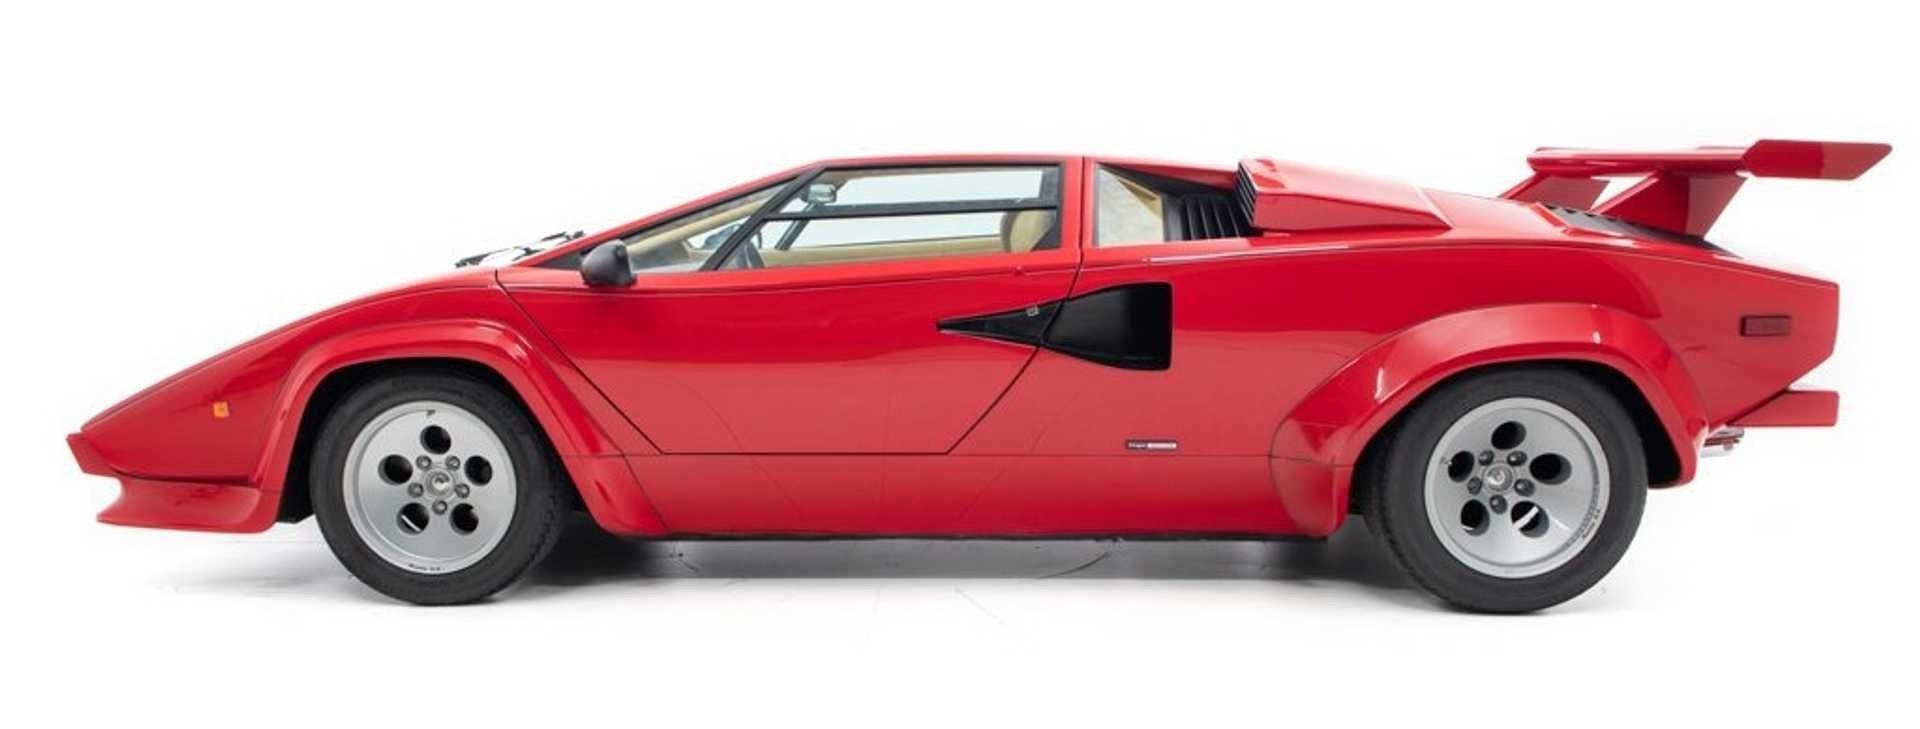 Lamborghini Countach M A Exterior (5)